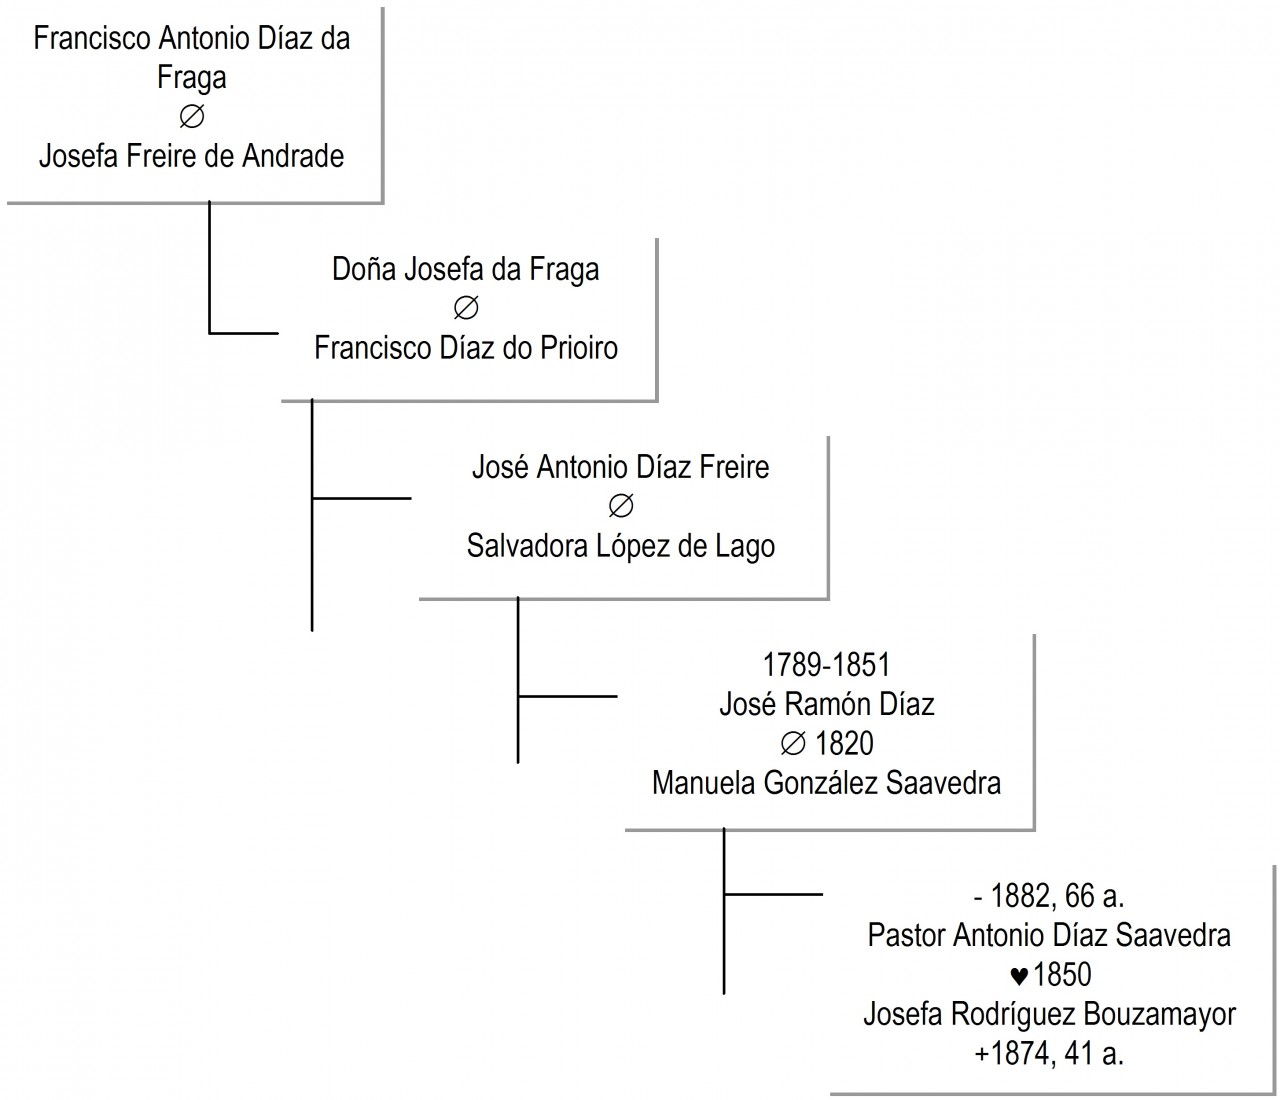 imagen 5 decendientes francisco diaz da fraga